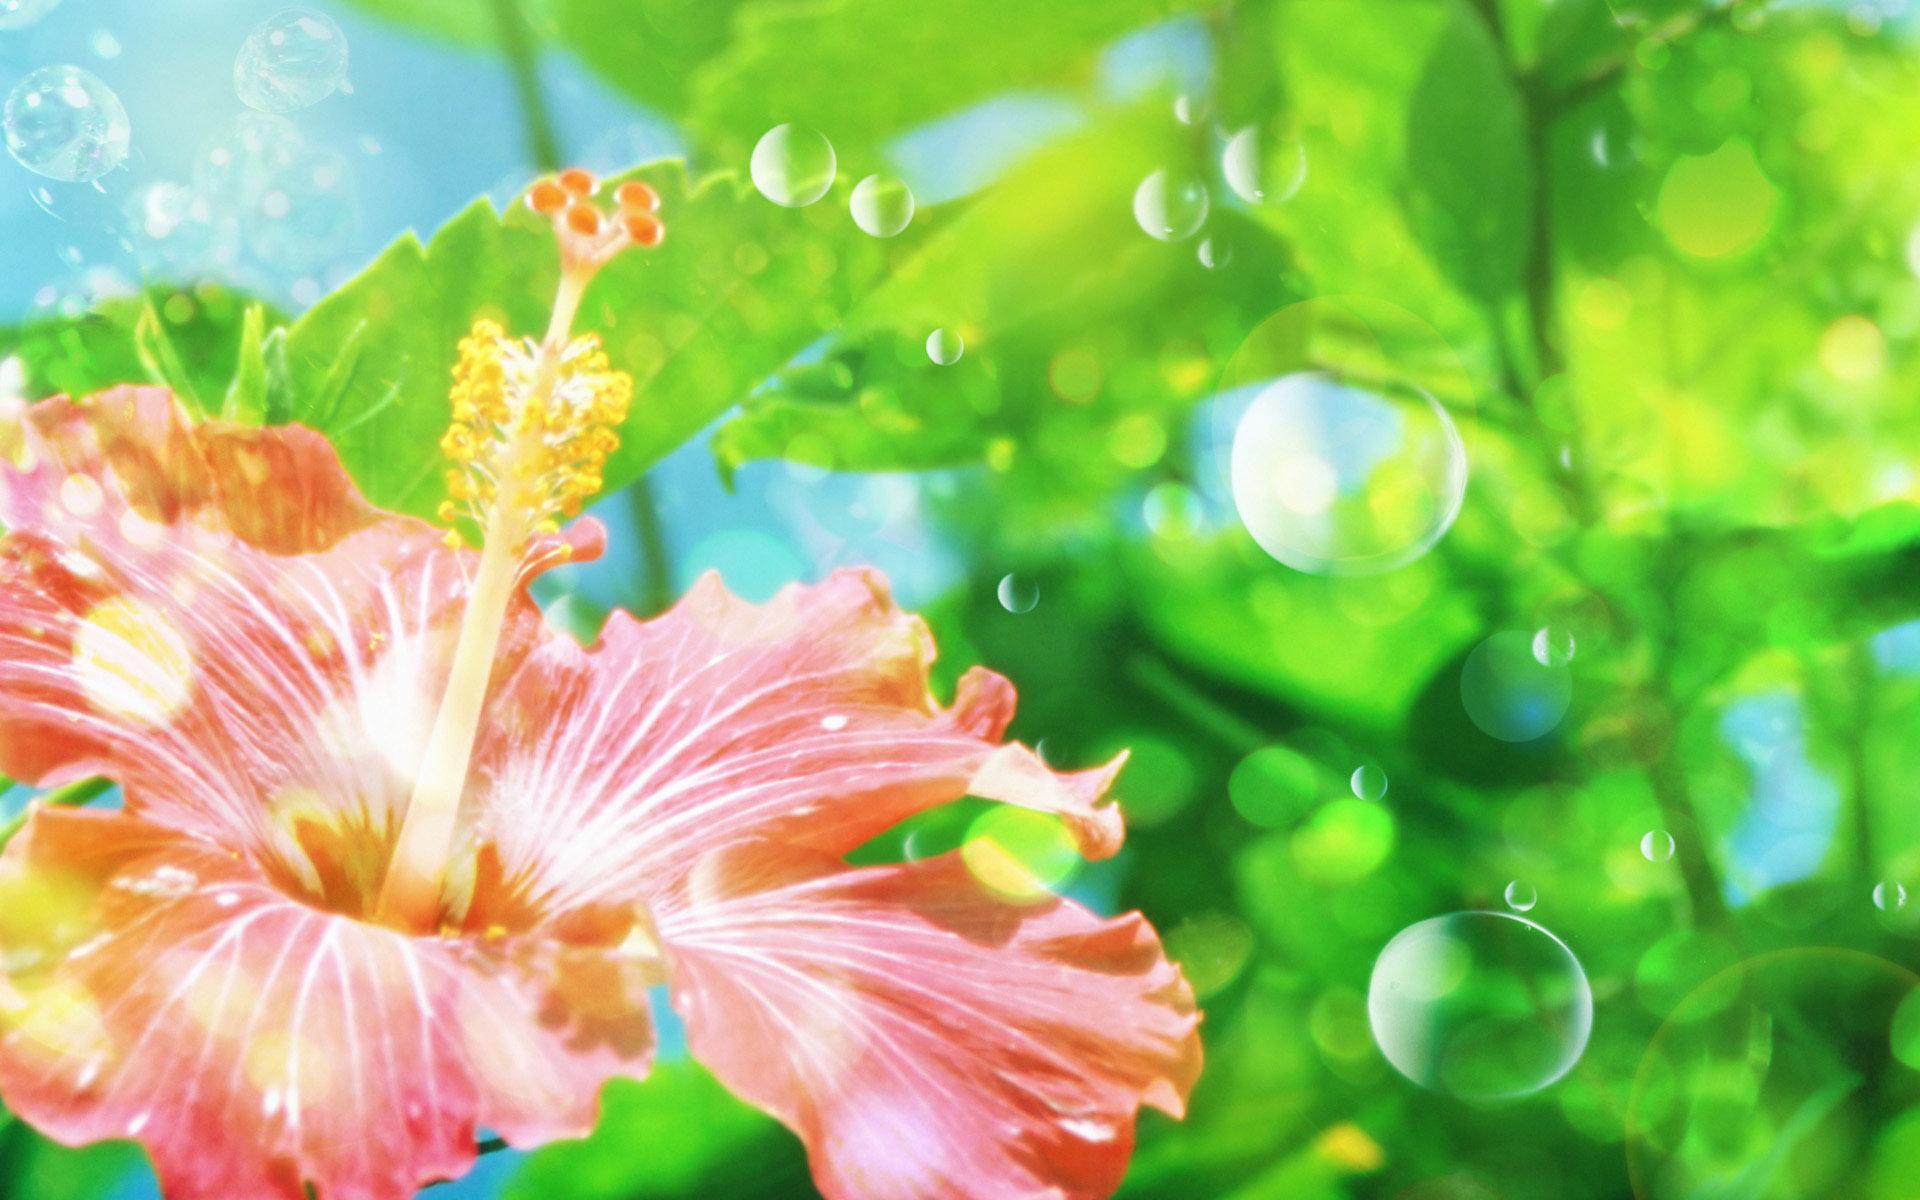 Free Fairies And Fantasy Wallpaper For Vista